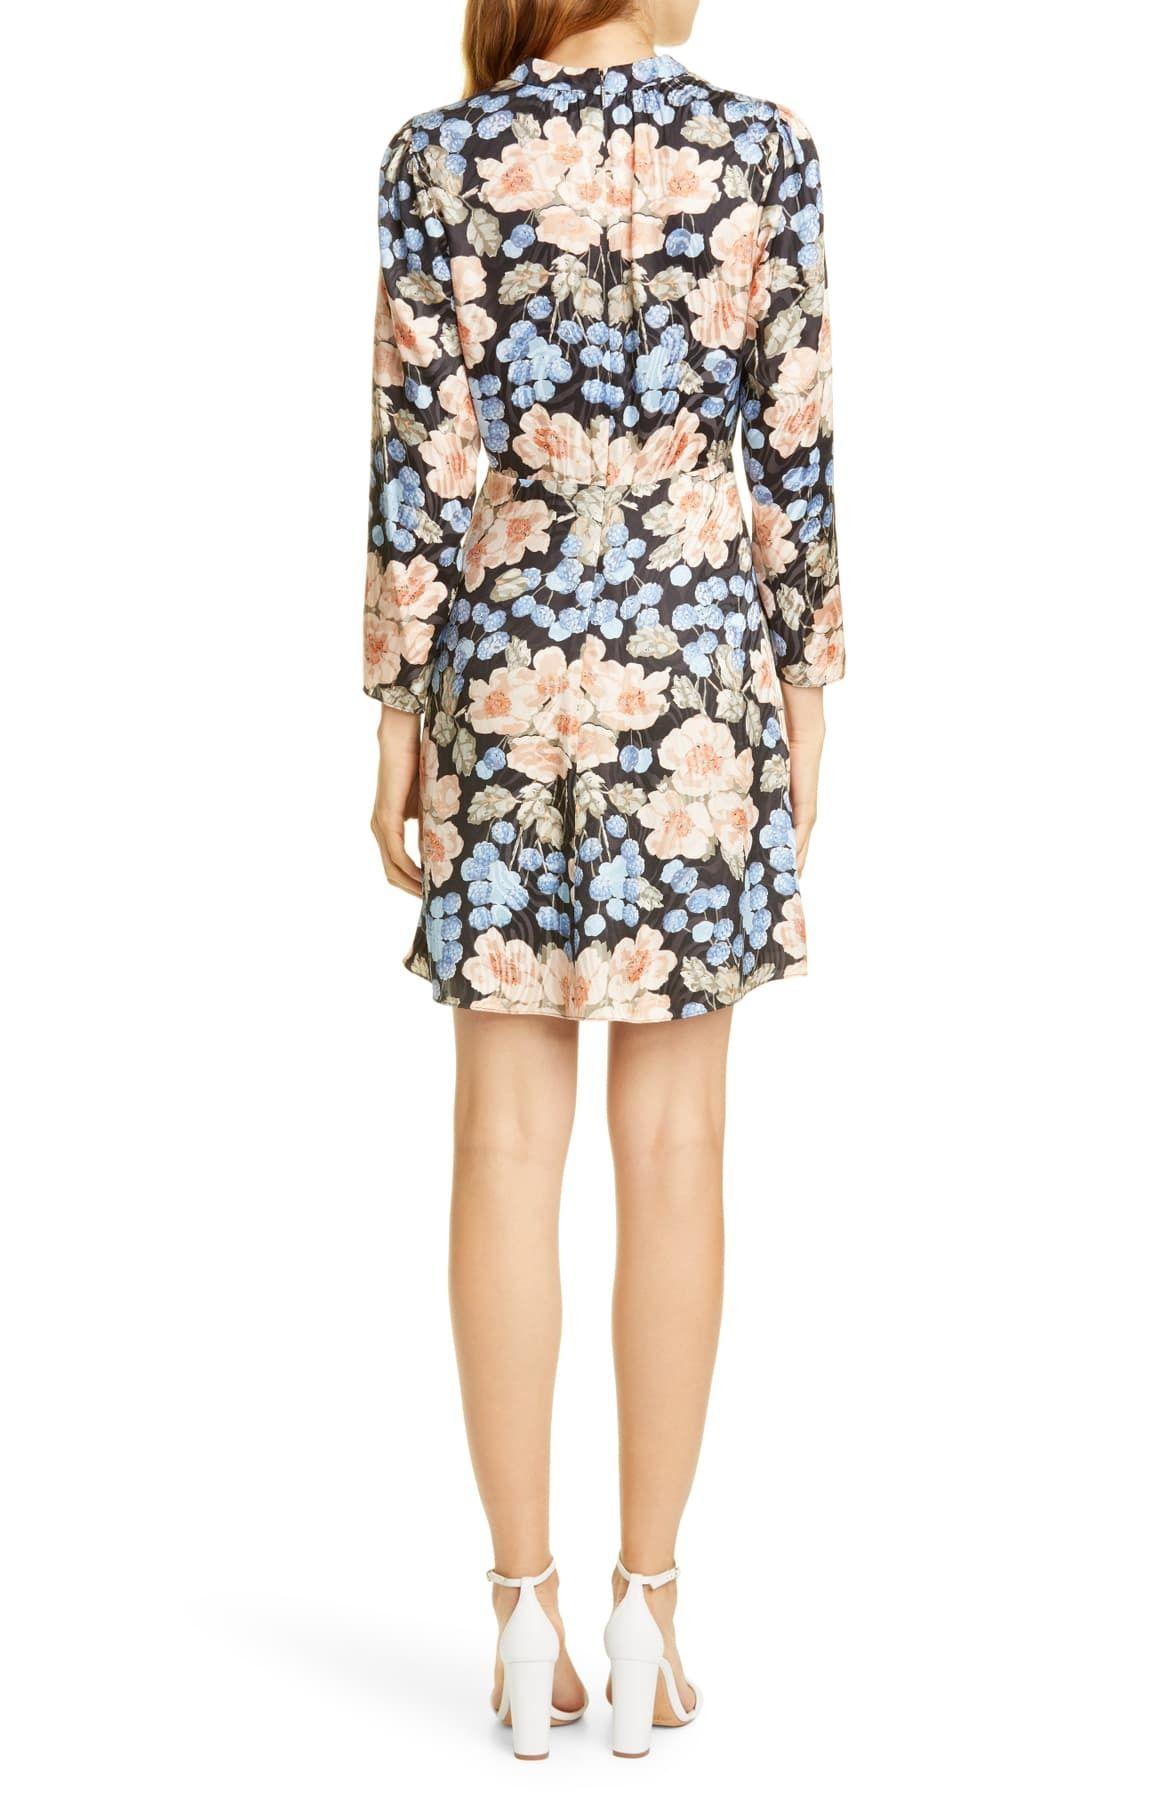 Rebecca Taylor Women's Dress Black Size 8 A-Line Floral Printed Silk